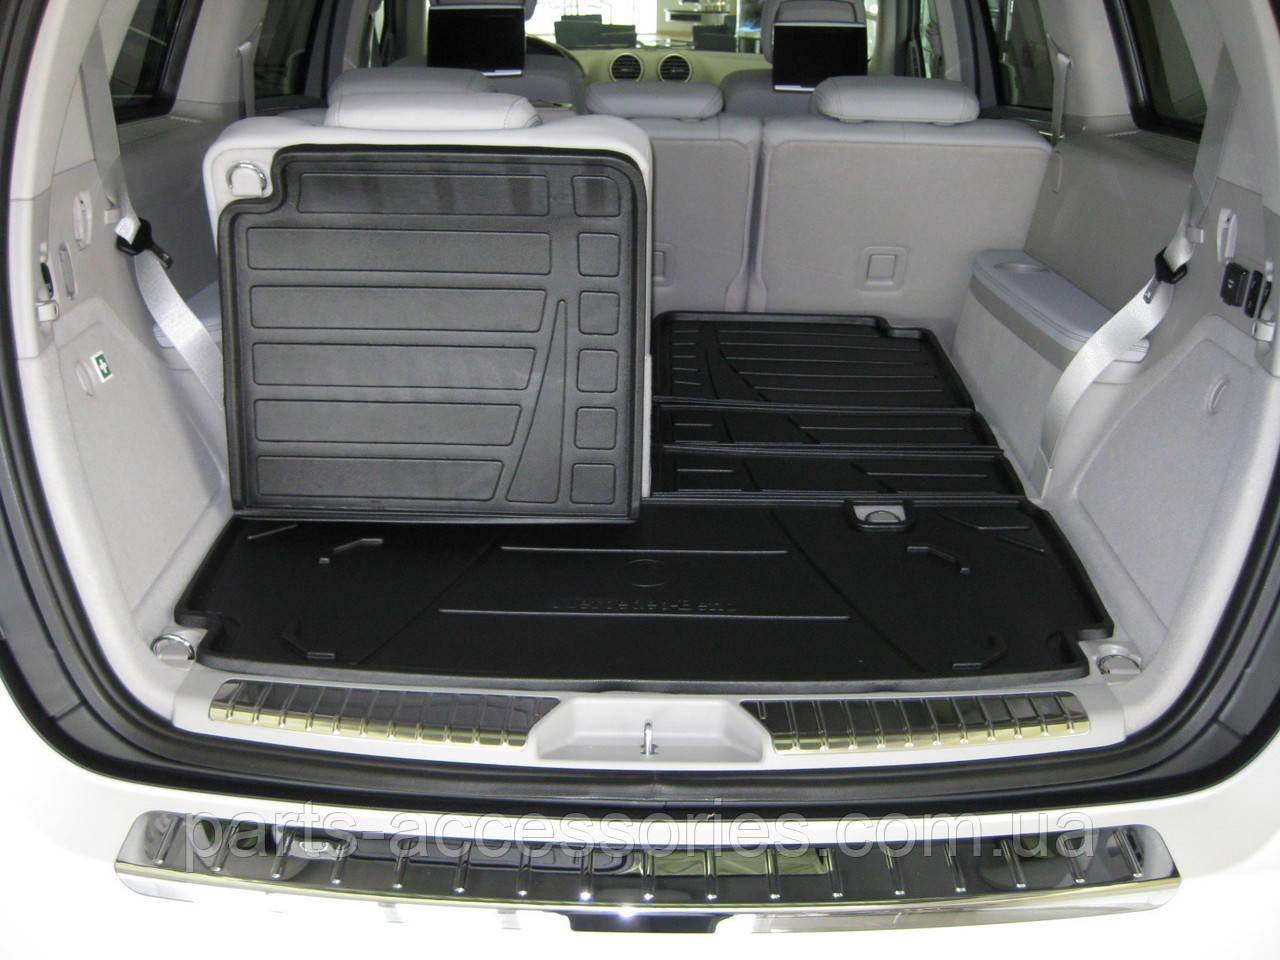 Mercedes GL GL-Class X166 2012-15 GL350 GL450 GL500 GL550 GL63 складной коврик в багажник Новый Оригинал